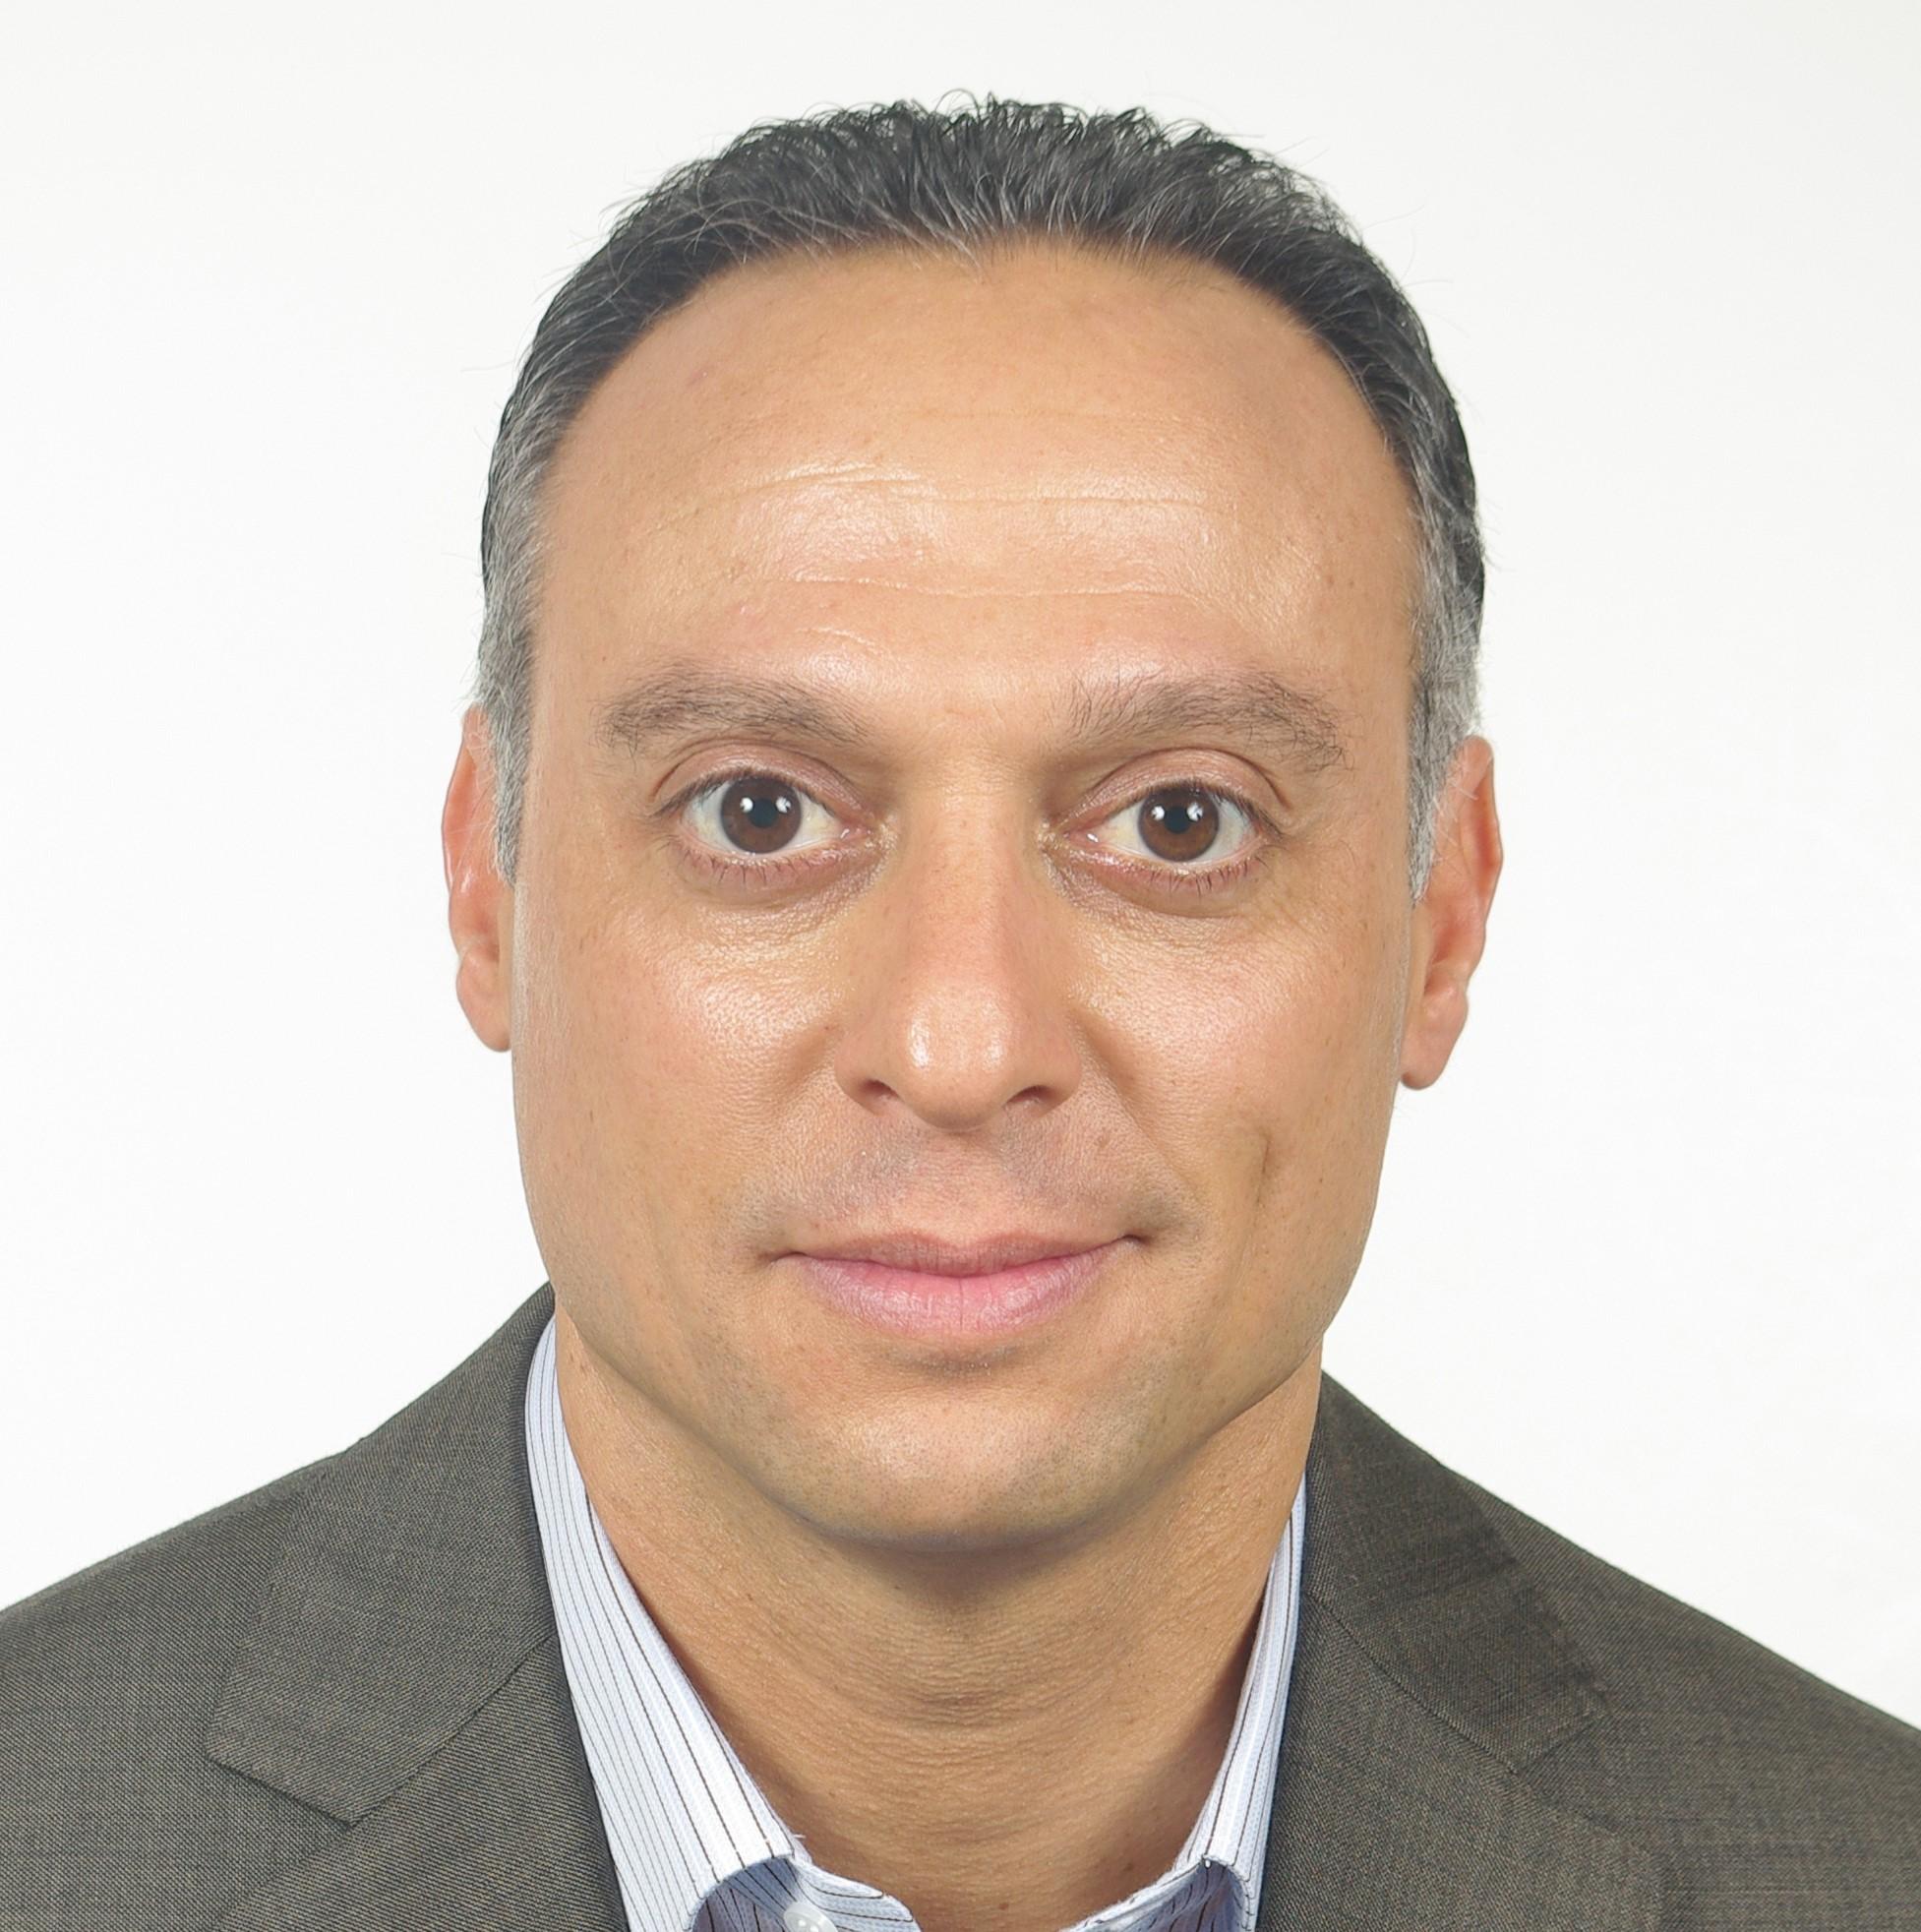 Luis G. Santine Jr. - InfoCapital N.V. Advisory & Management